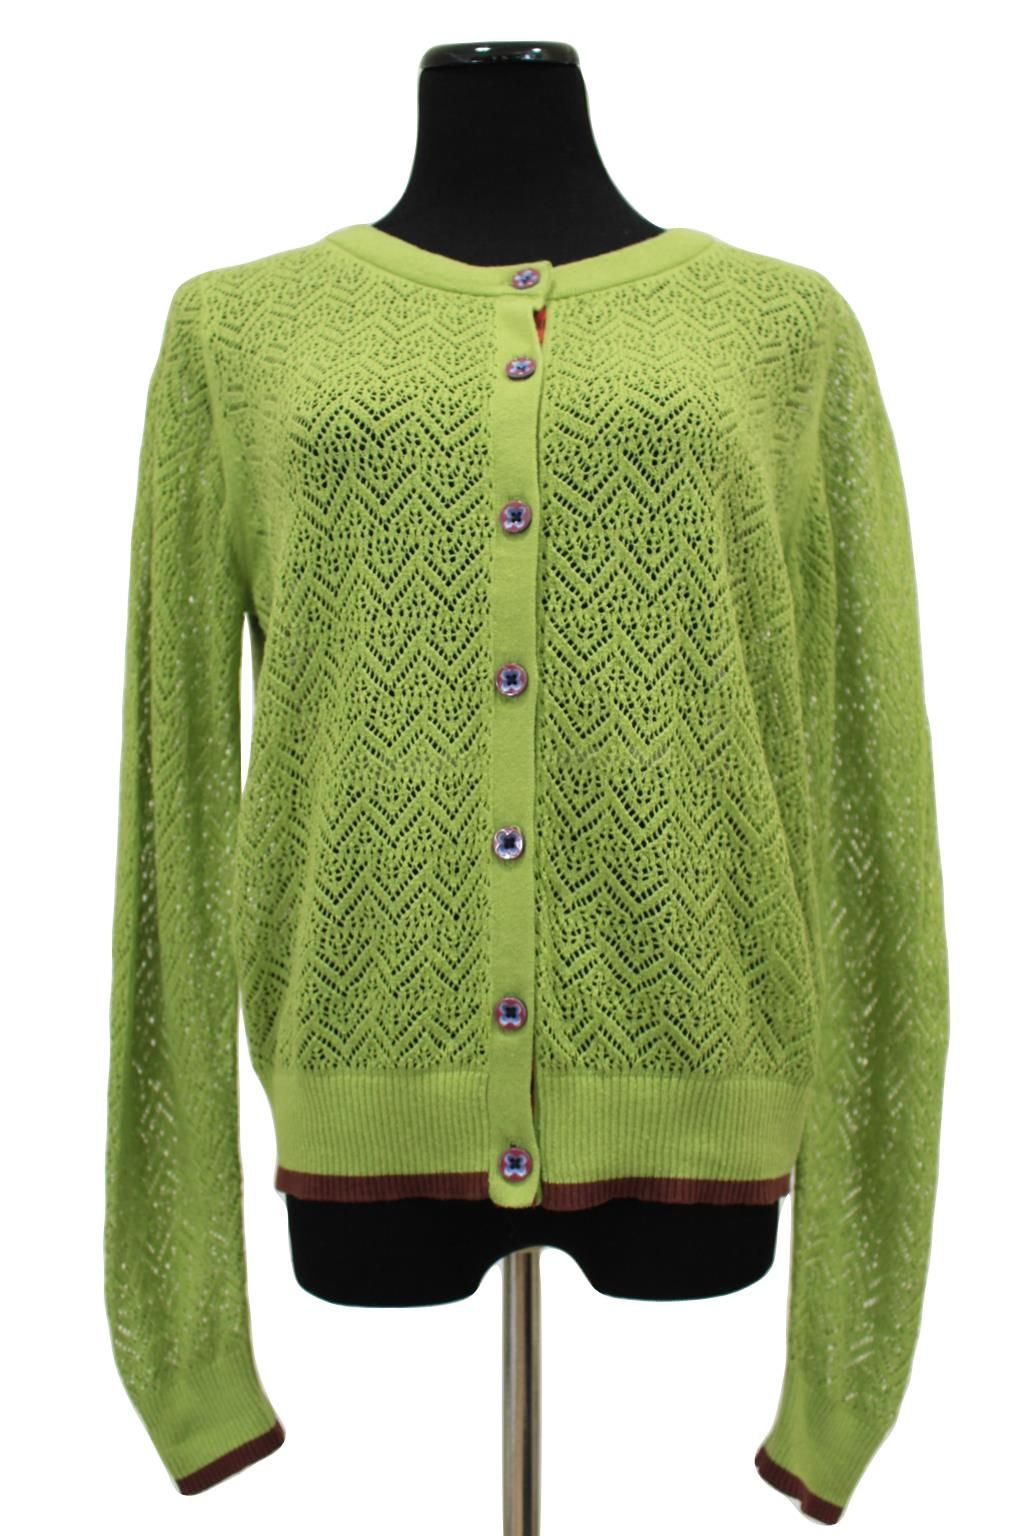 1c84170587c69 Matilda Jane Green Crochet Knit Cardigan Sweater Size L